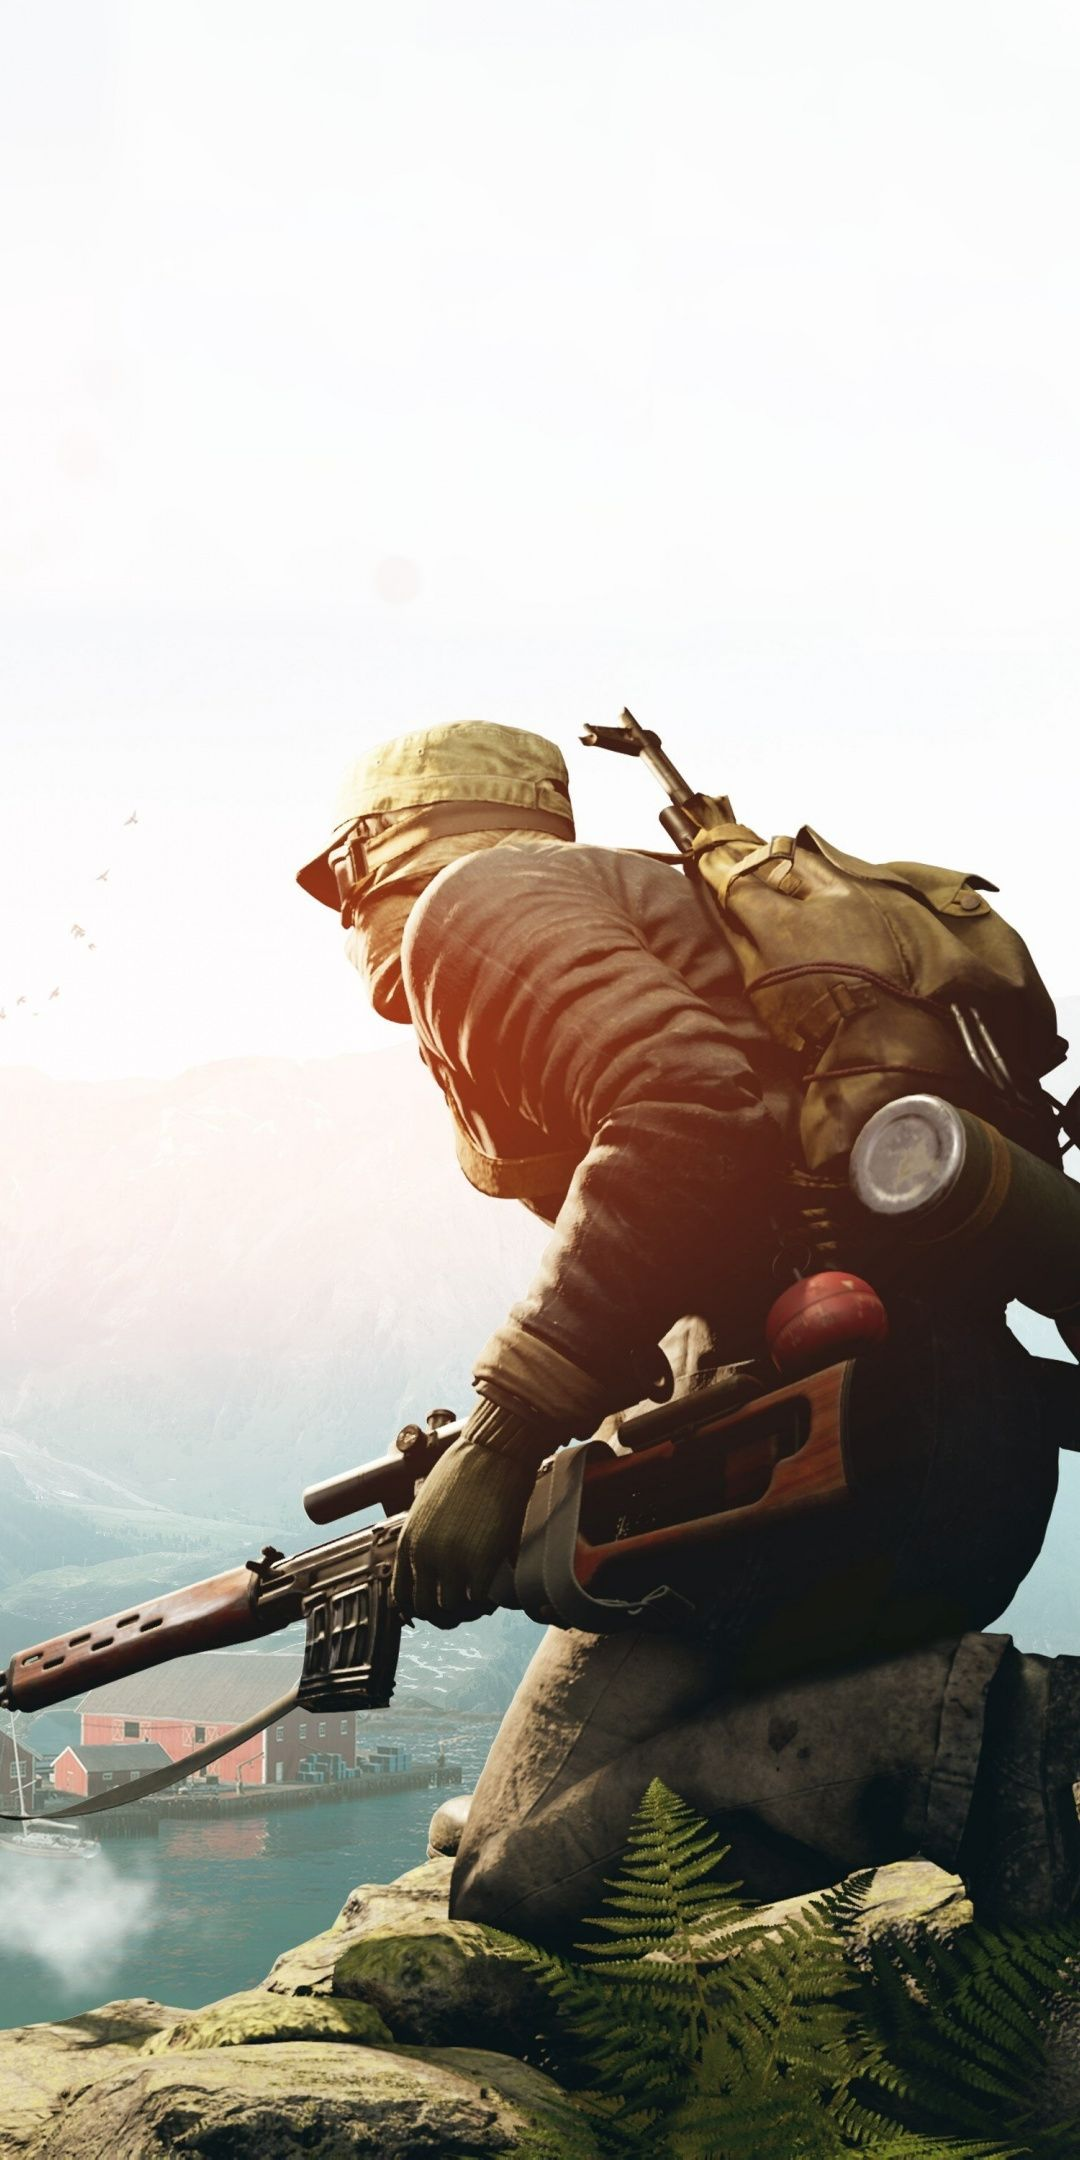 Soldier Vigor 2018 Survival Game 1080x2160 Wallpaper Gaming Wallpapers Survival Games Best Gaming Wallpapers